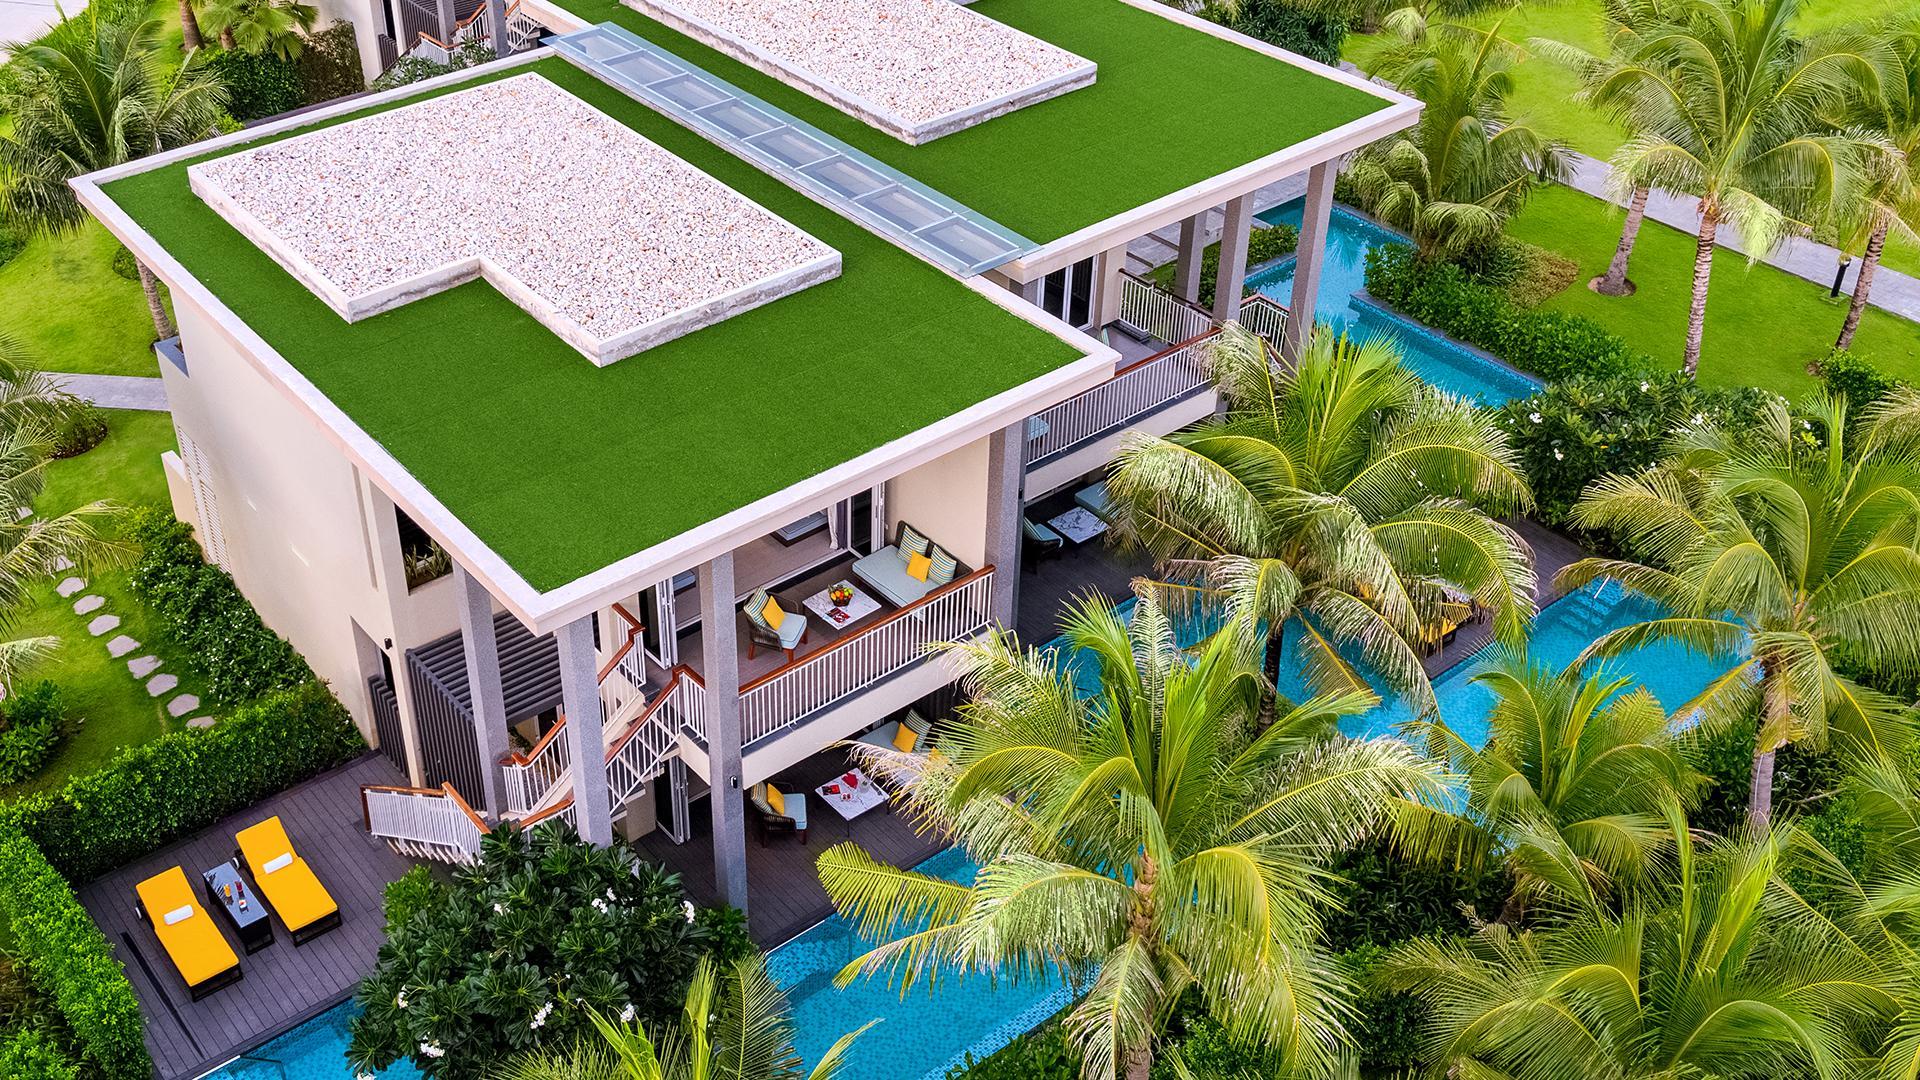 Family Cabana Pool Access image 1 at Pullman Phu Quoc Beach Resort by null, tỉnh Kiên Giang, Vietnam